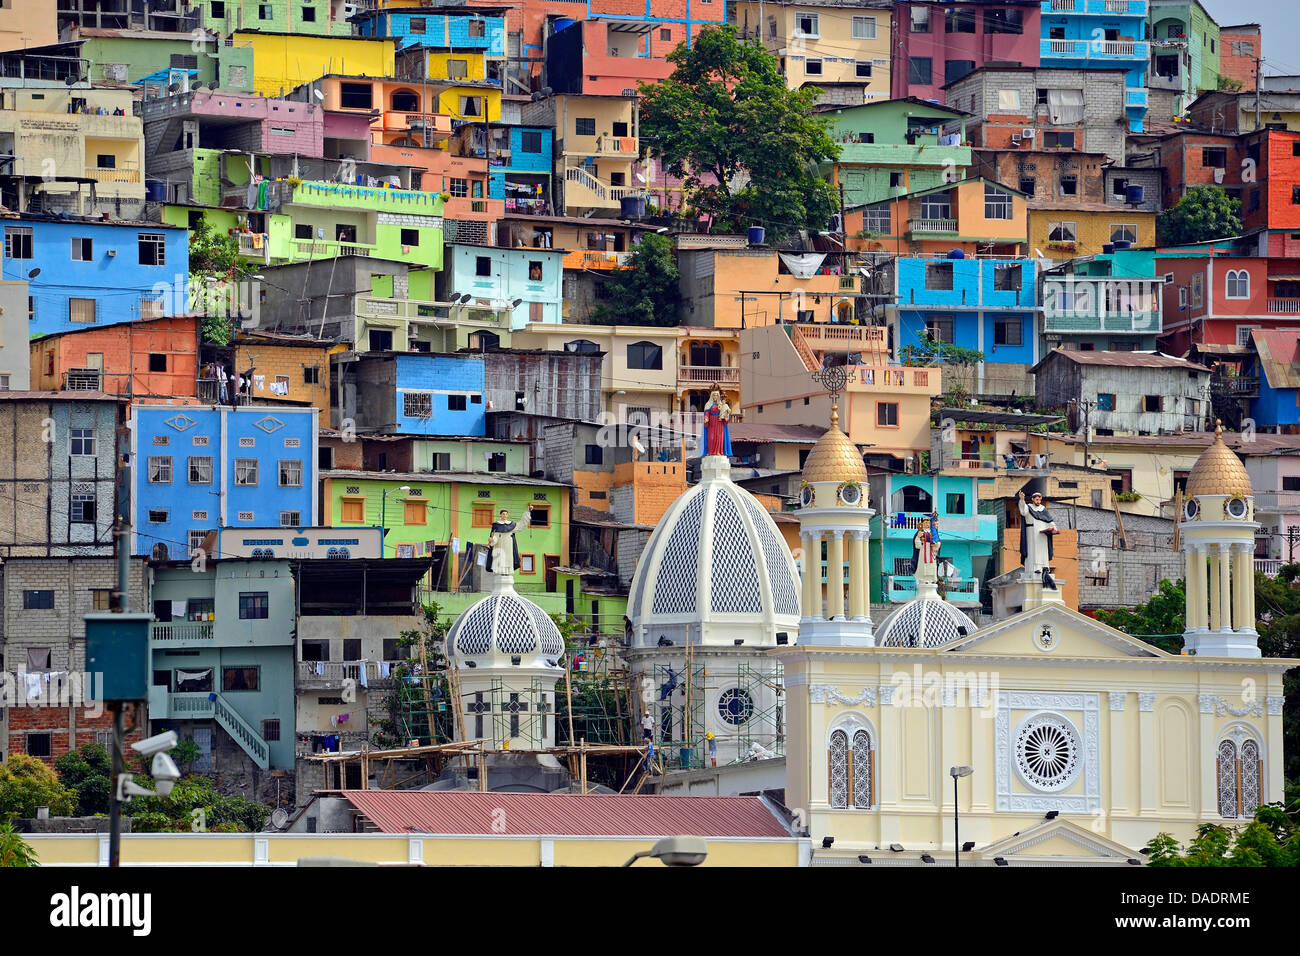 colorful houses in the city, Cerro del Carmen, Ecuador, Guayaquil Stock Photo